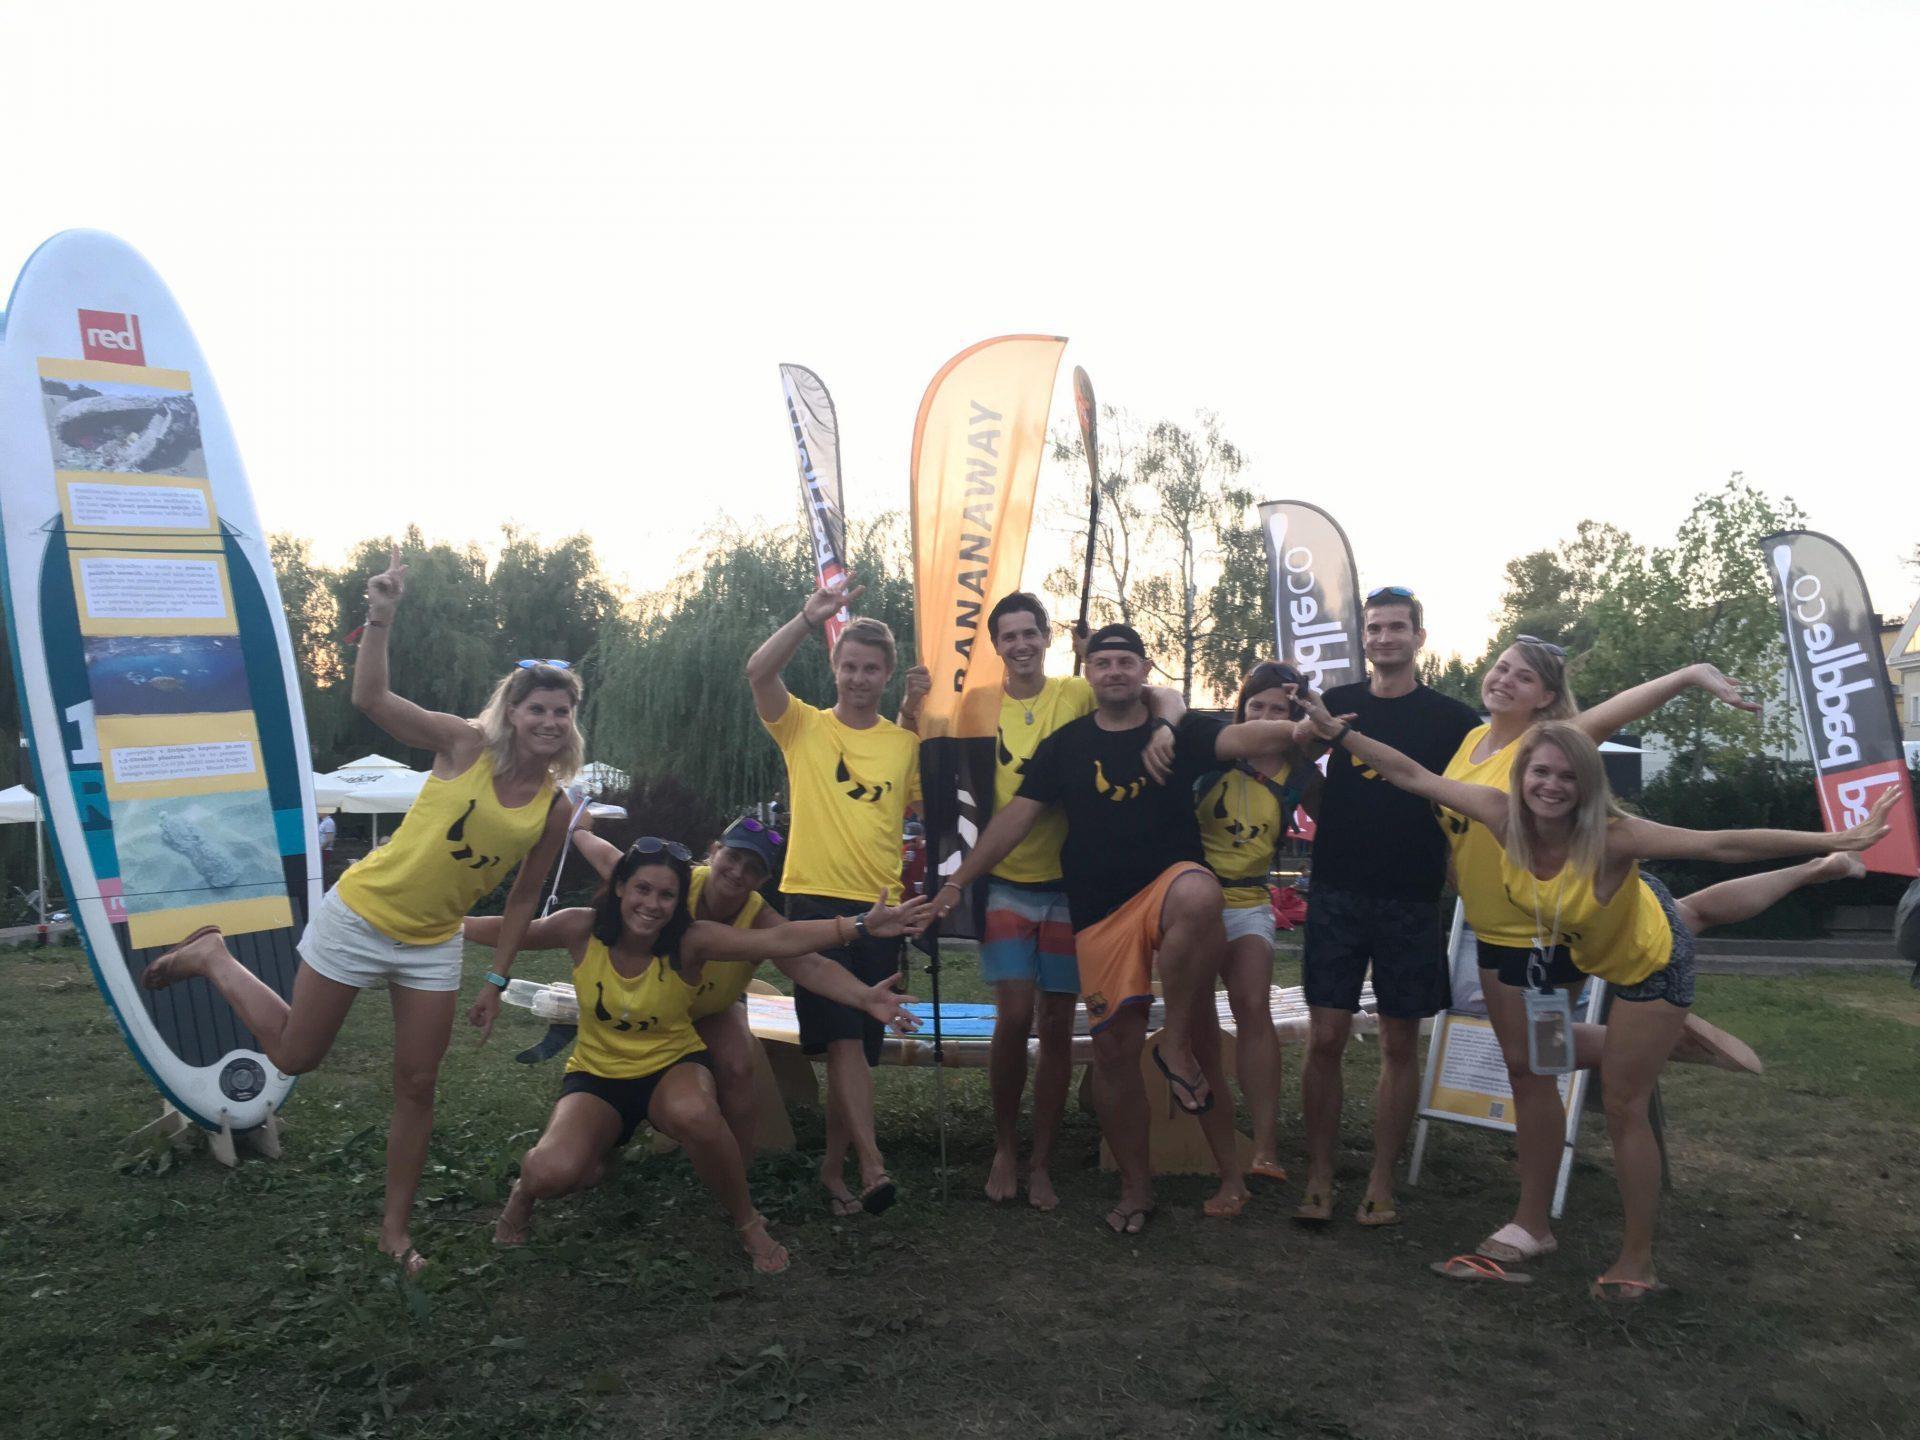 Bananaway ekipa_100 supov na ljubljanici (2)